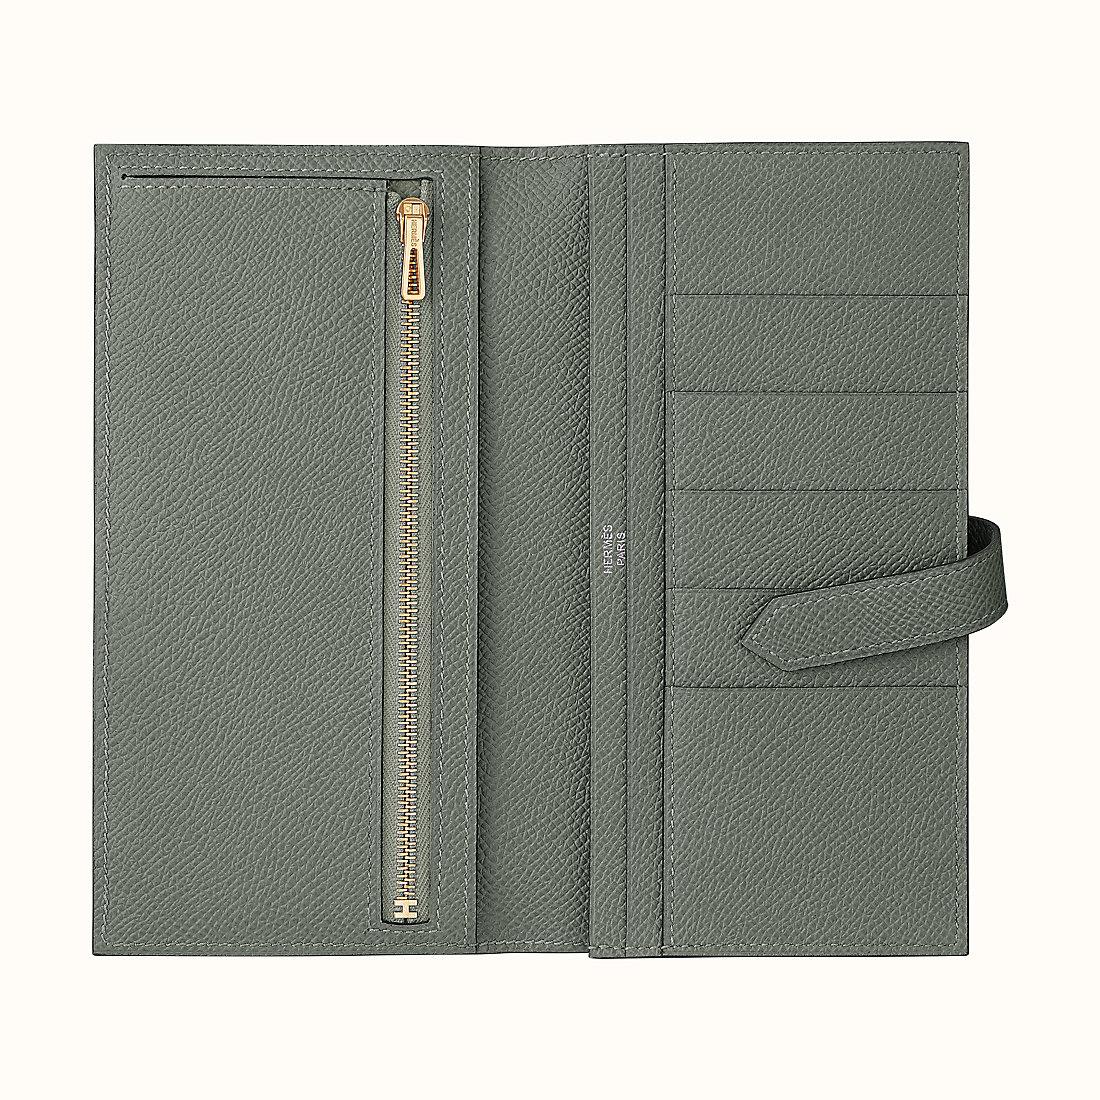 臺灣嘉義市愛馬仕錢包 Hermes Bearn wallet CC63 Vert Amande Epsom